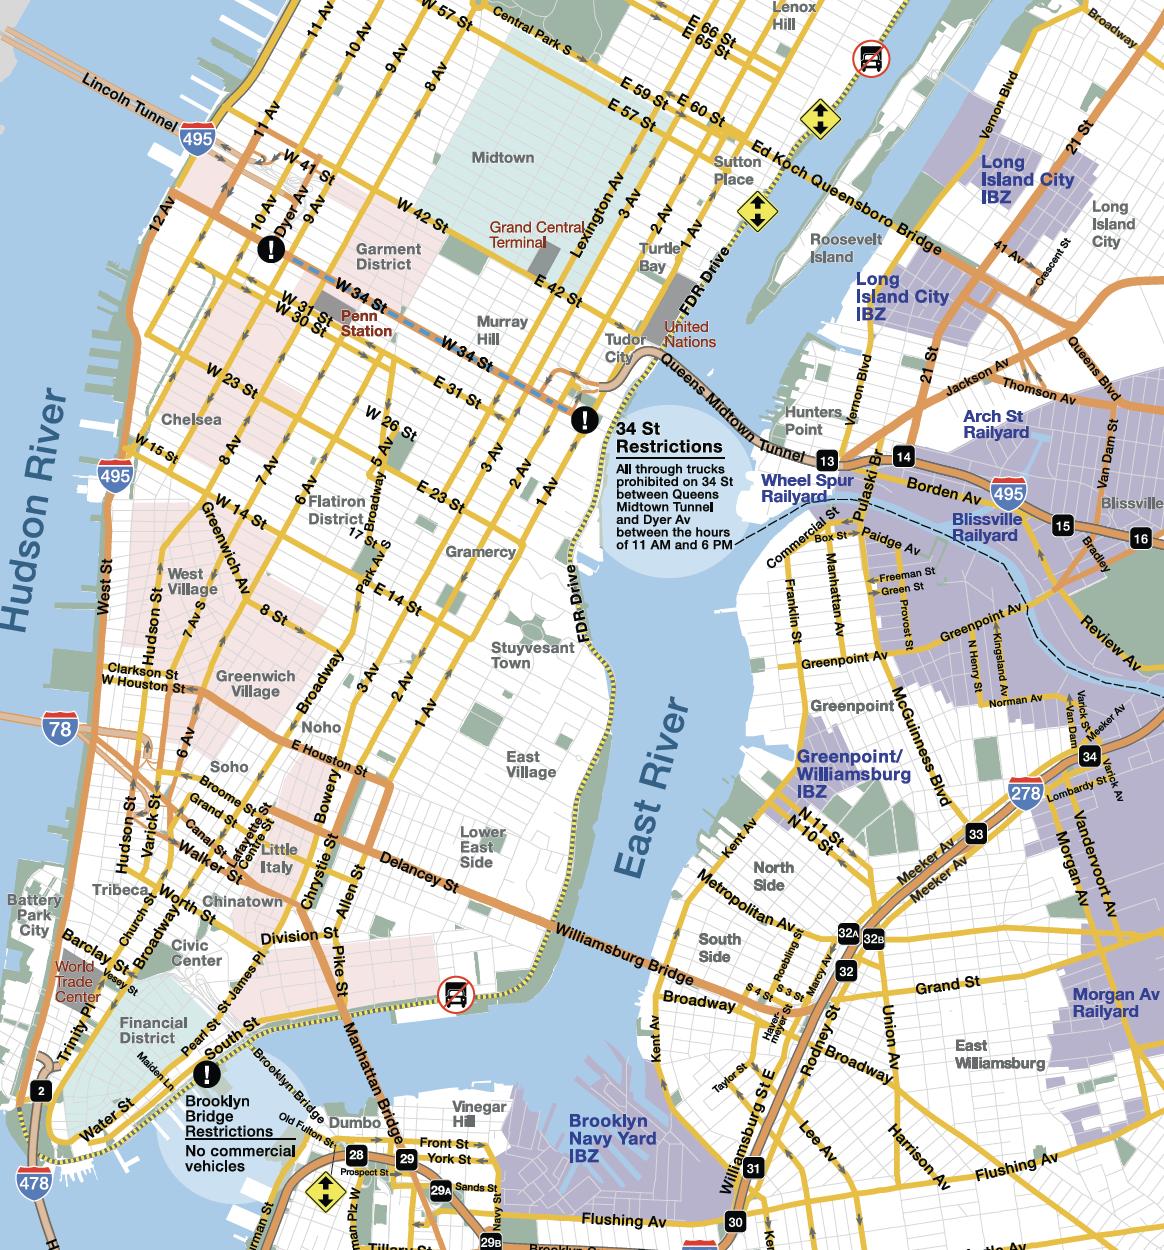 Vision Zero NYCDOT Truck Map